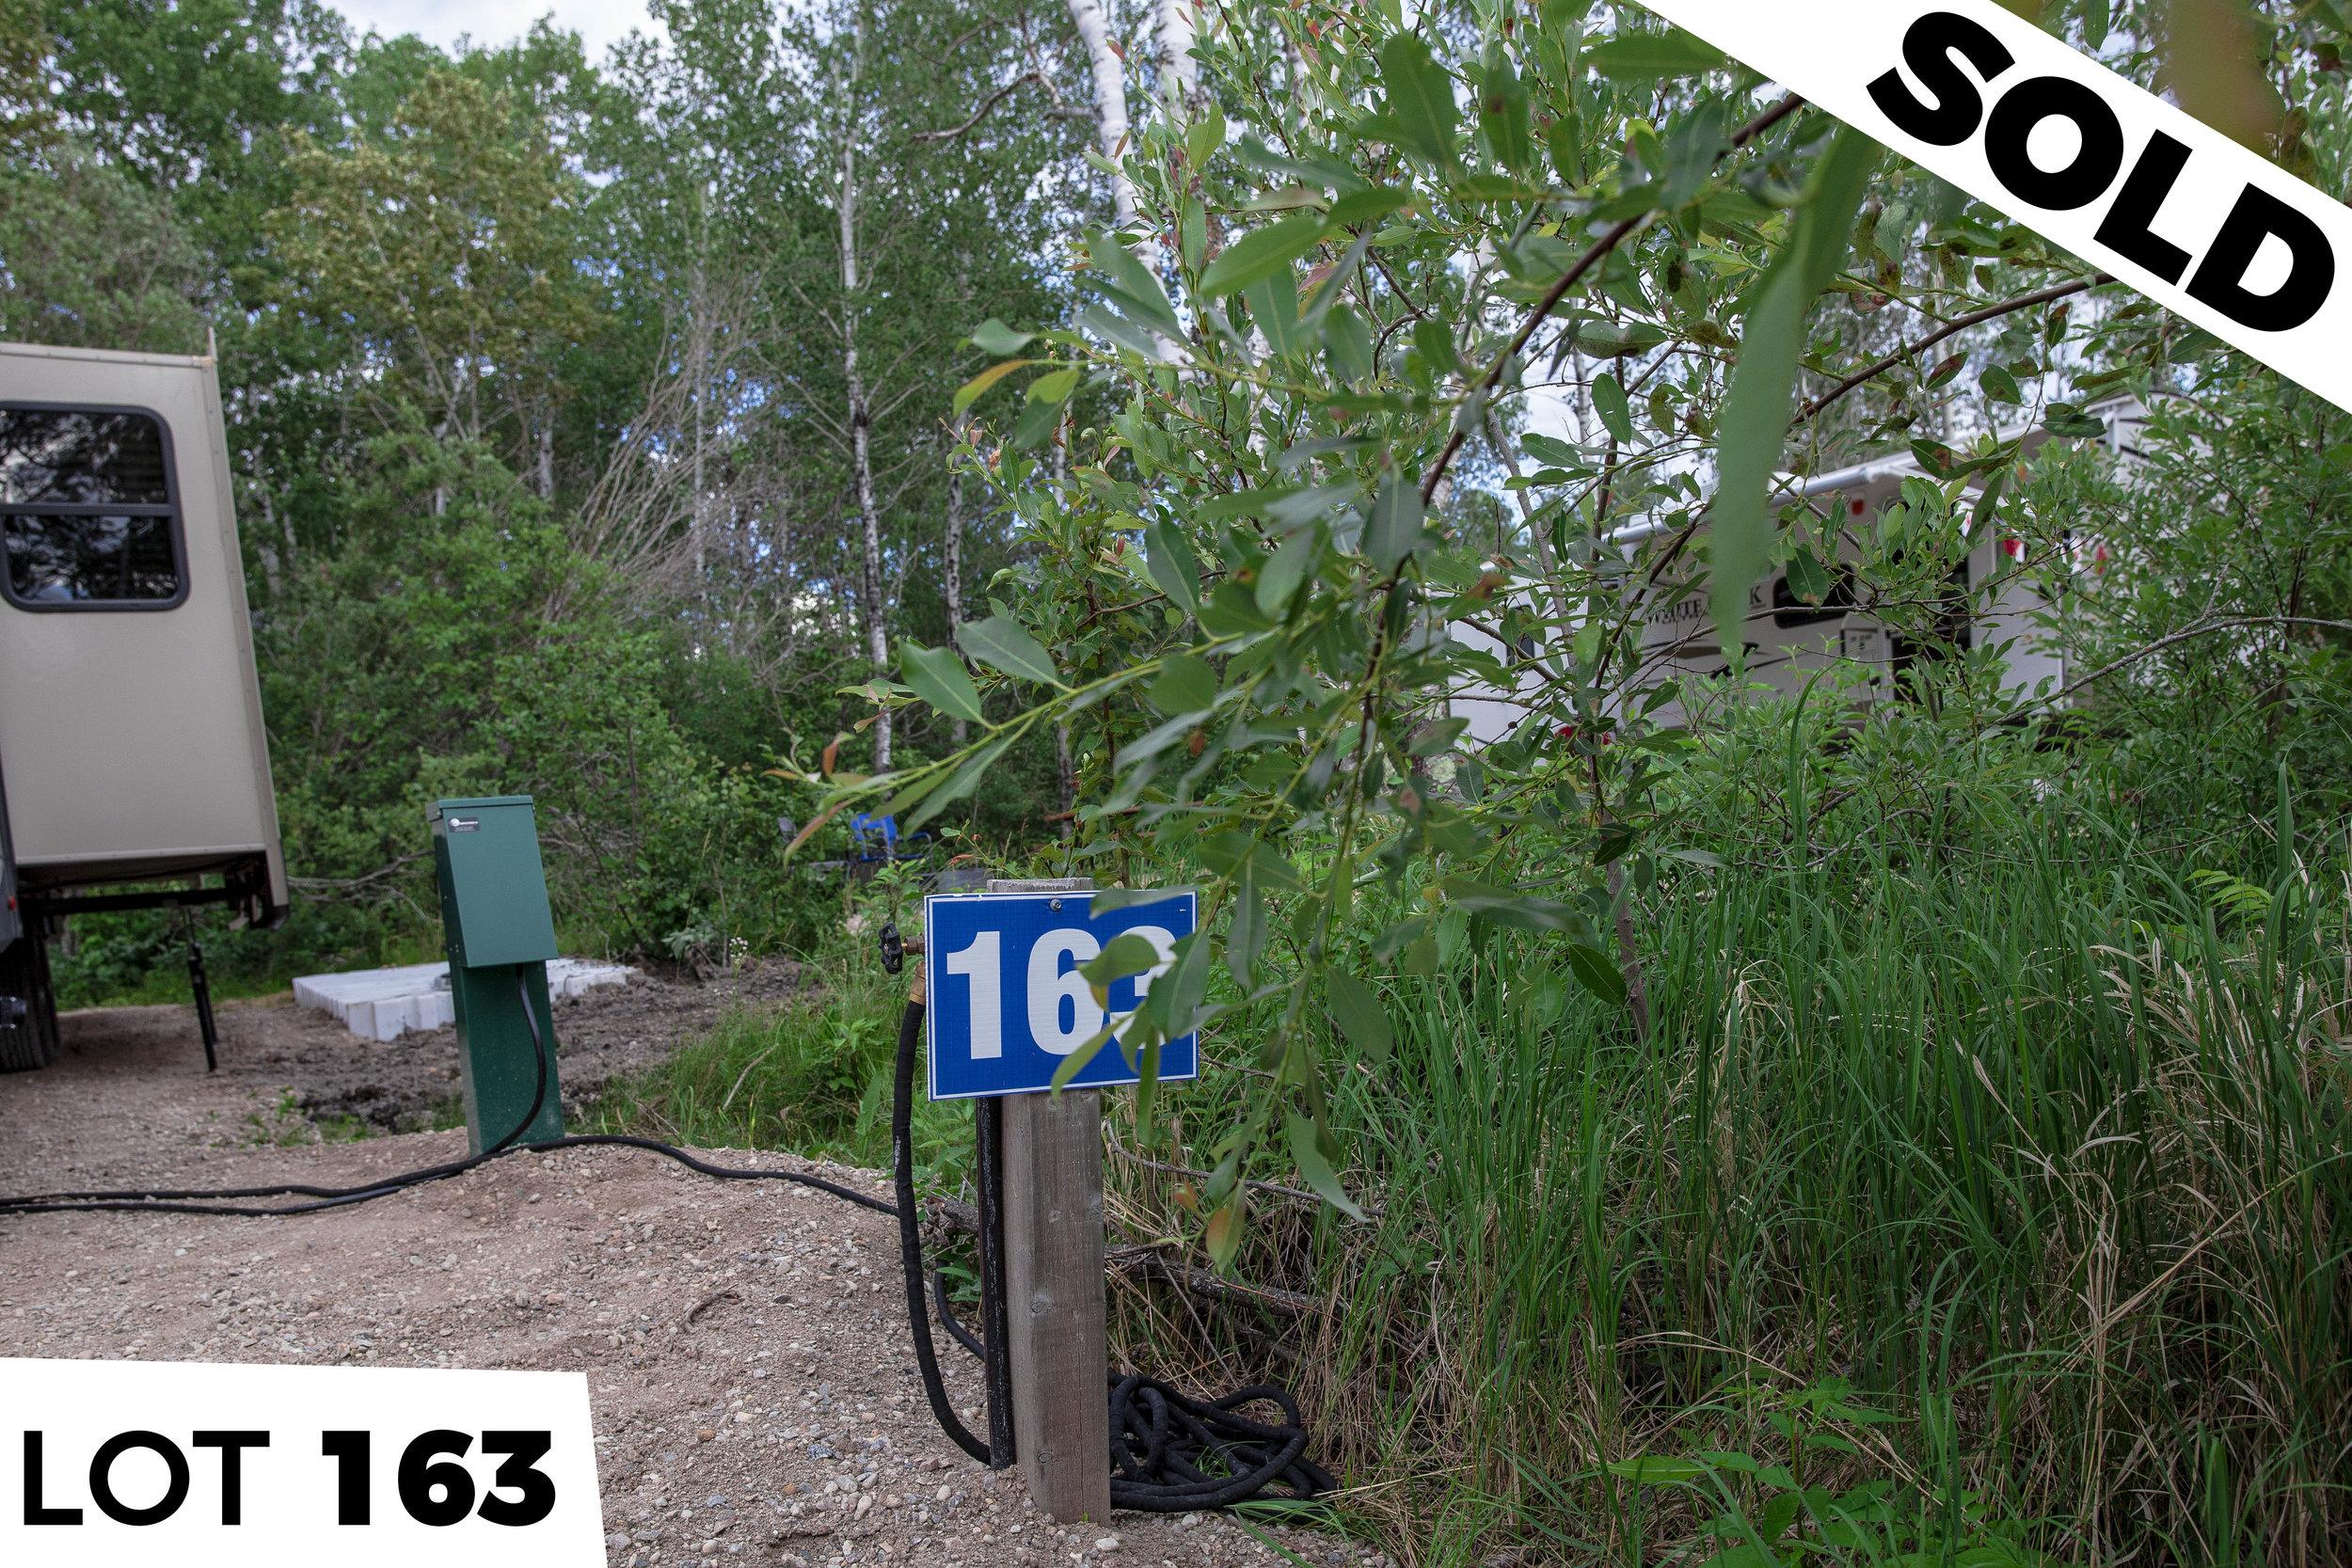 Grand Palms RV Resort - Lot #163